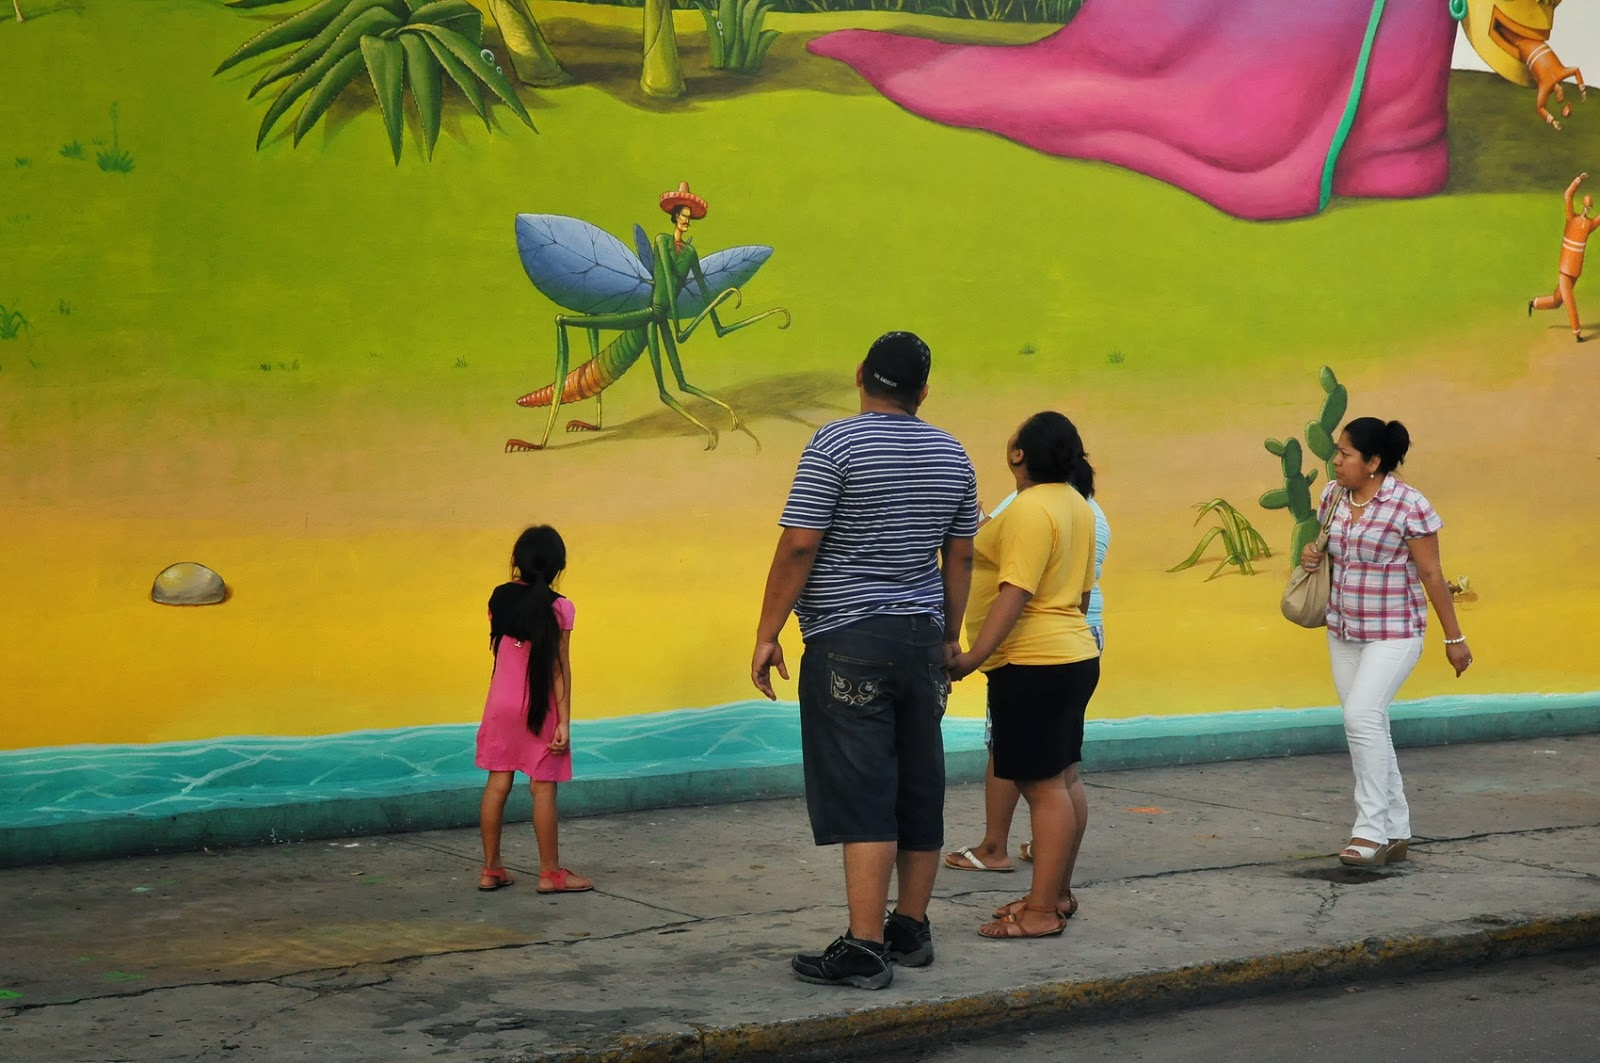 interesni-kazki-new-mural-campeche-mexico-20